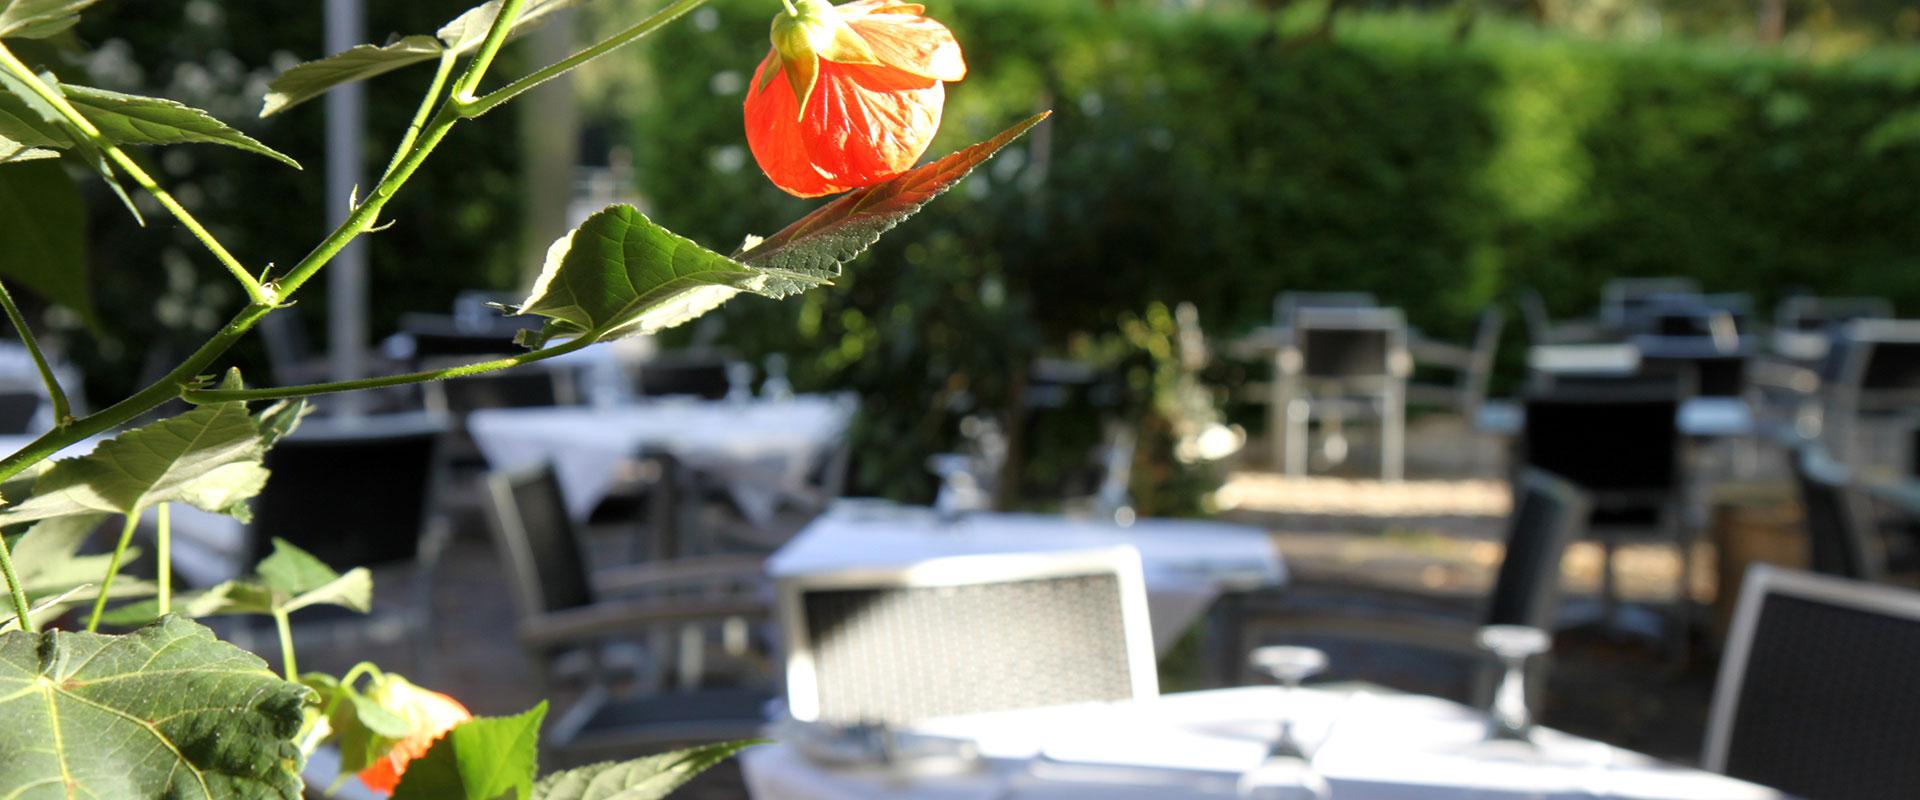 claudio-ristorante-001 ristorante - claudio ristorante 001 - Home